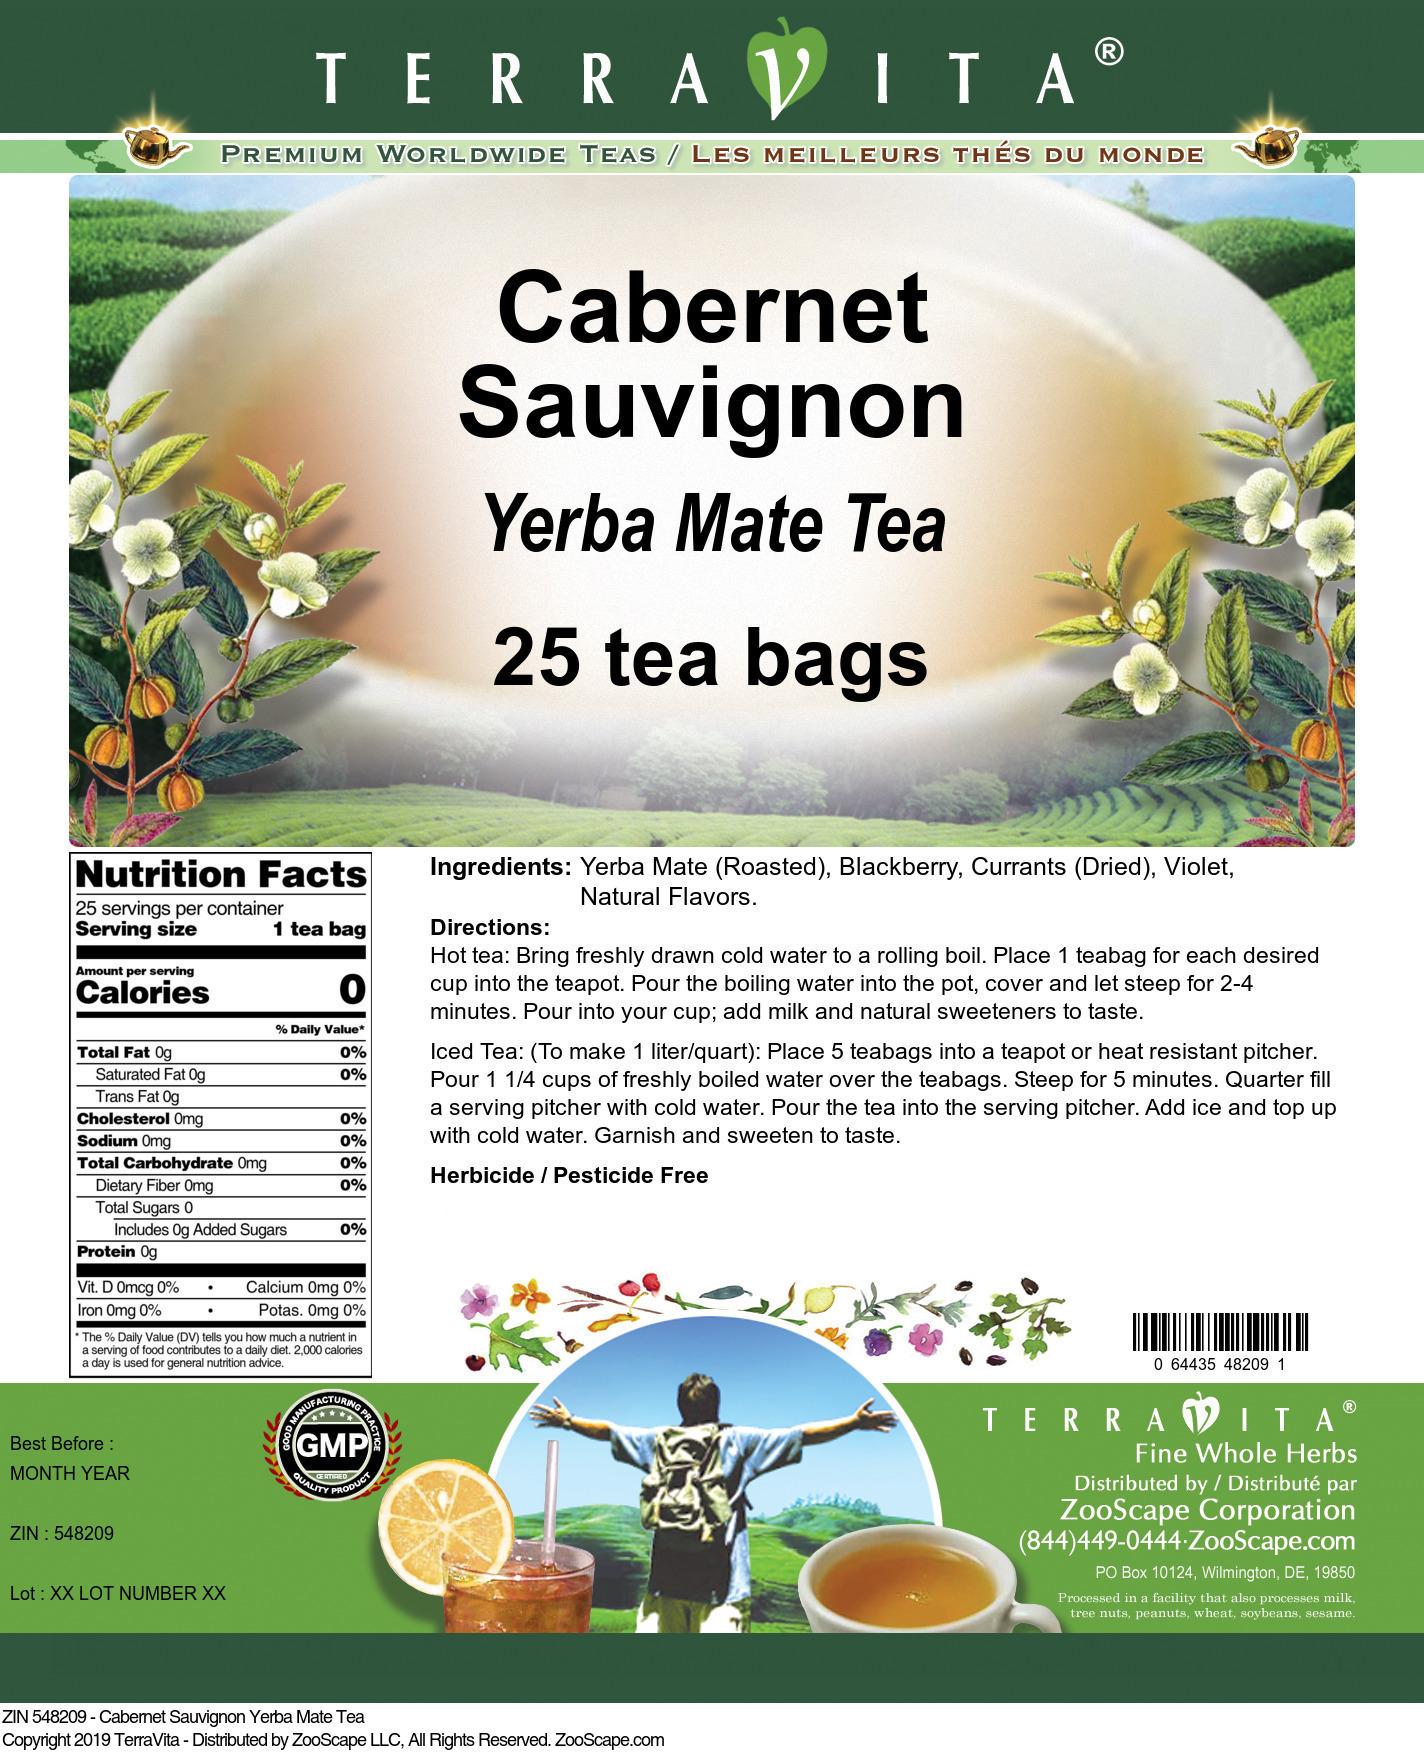 Cabernet Sauvignon Yerba Mate Tea